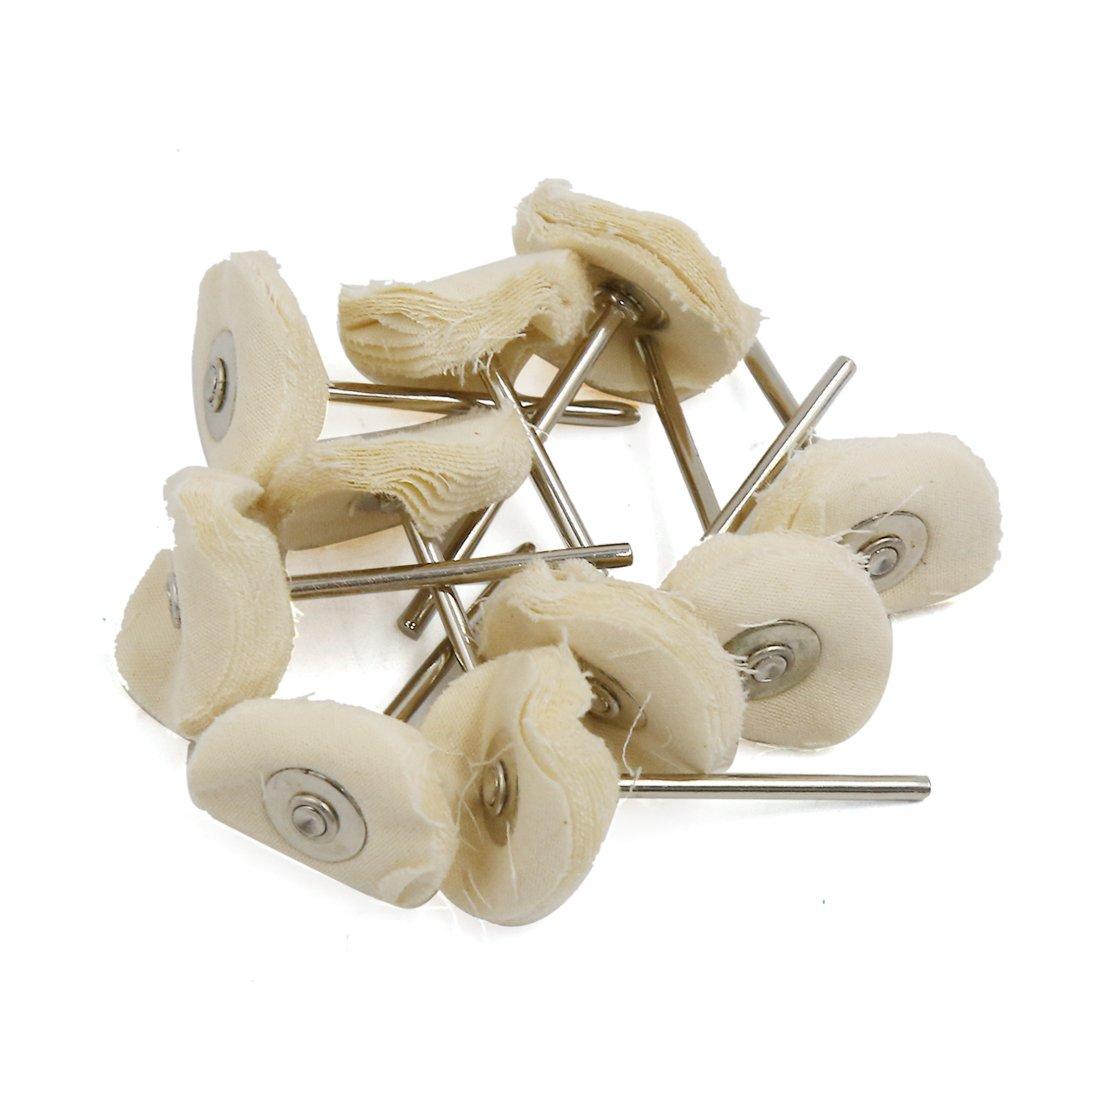 uxcell® 10 Pcs Round Shank 25mm x 3mm Cotton Blend Pad Jewelry Polishing Buffing Wheel